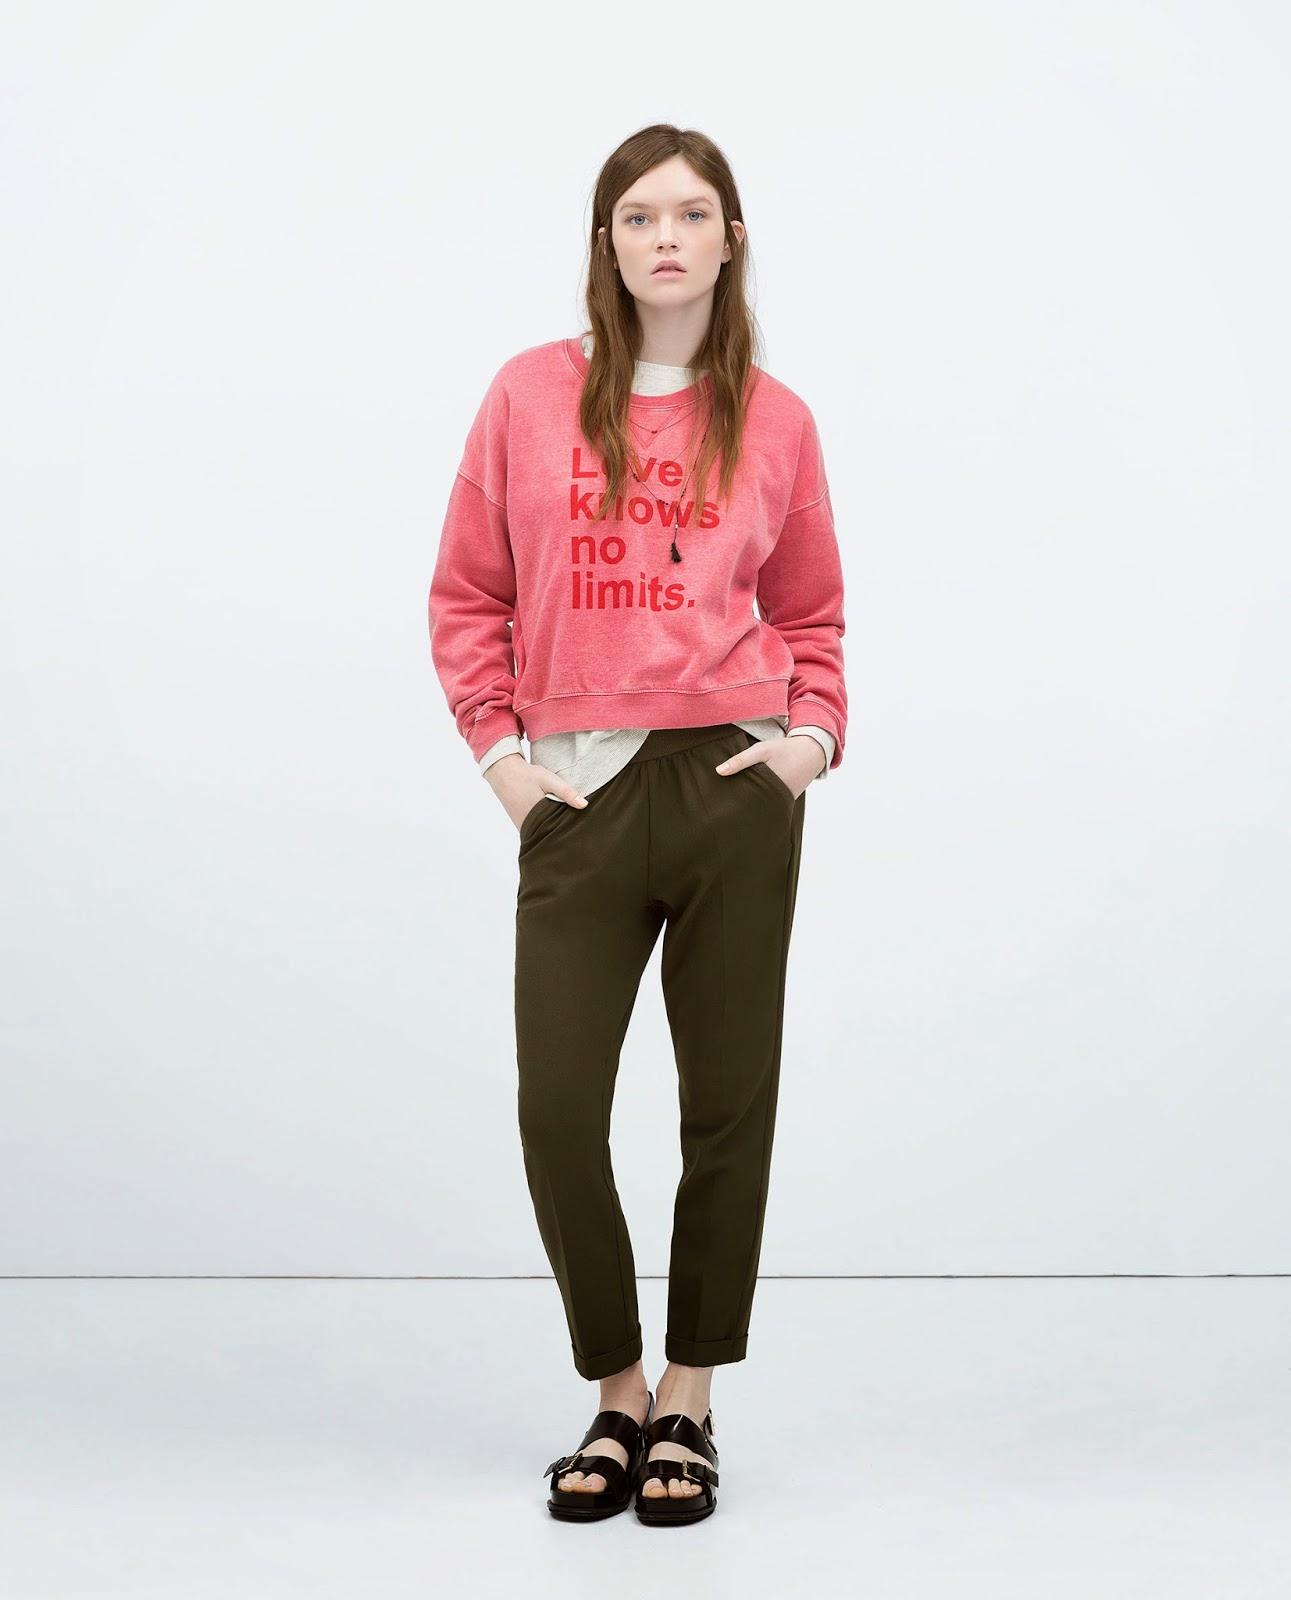 Look Zara, SS15, Blog de Moda, Cuatro ideas, Cool, Fashion, Trend